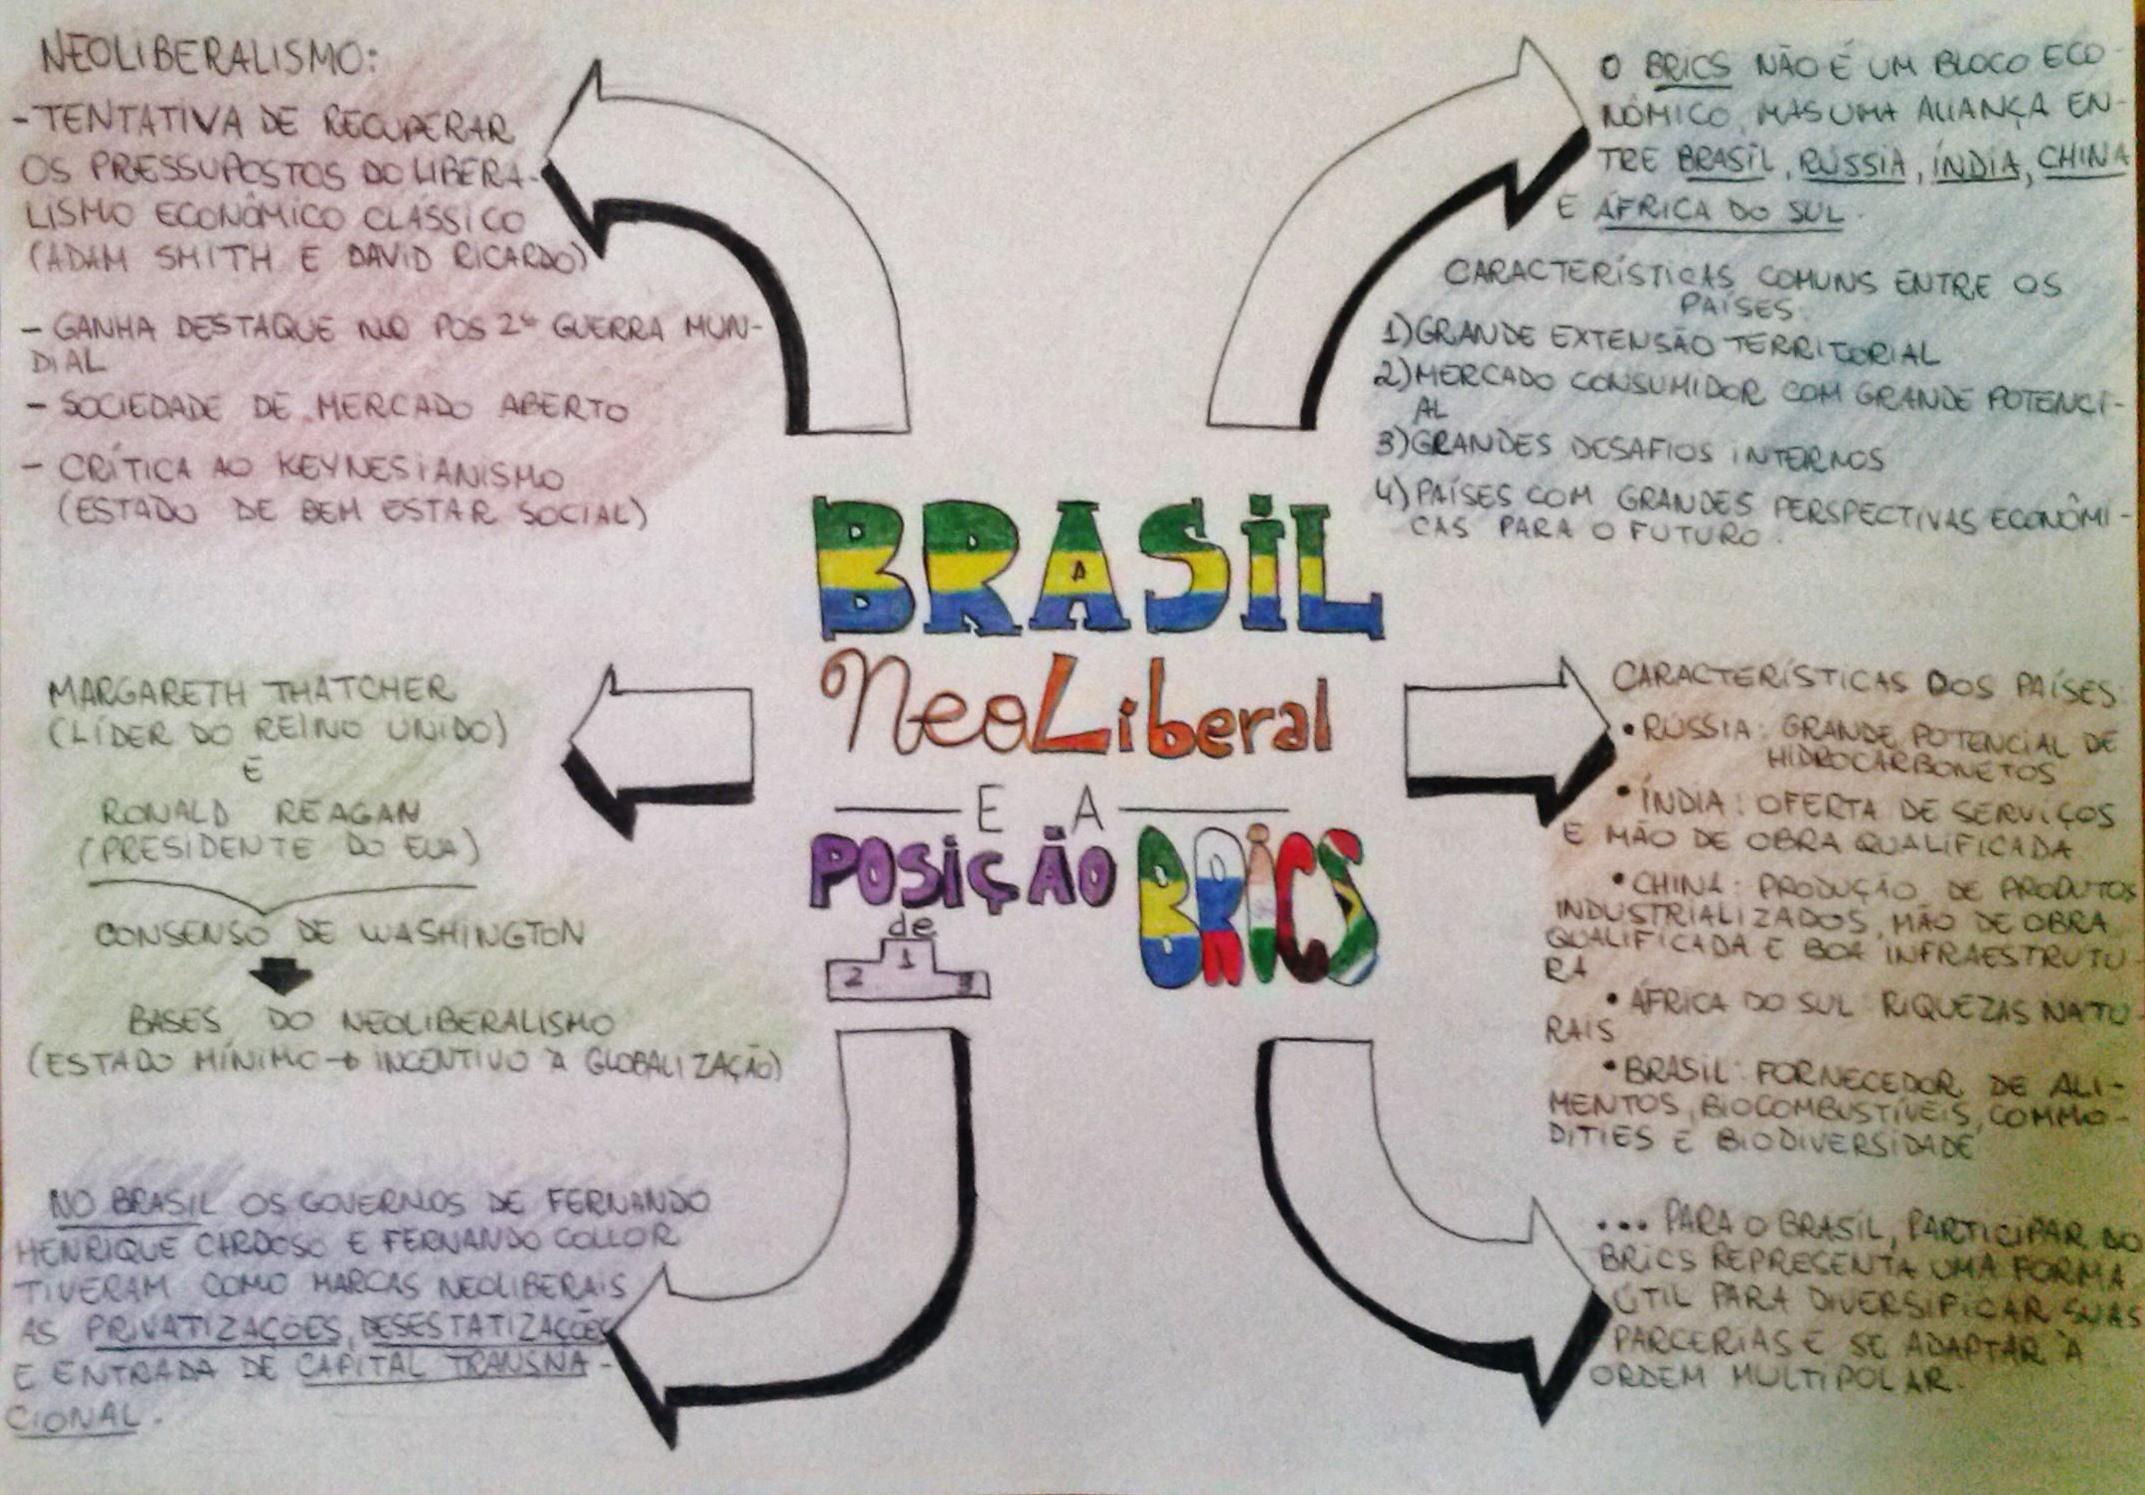 mapa-geo-brasil-neoliberal-posicao-brics